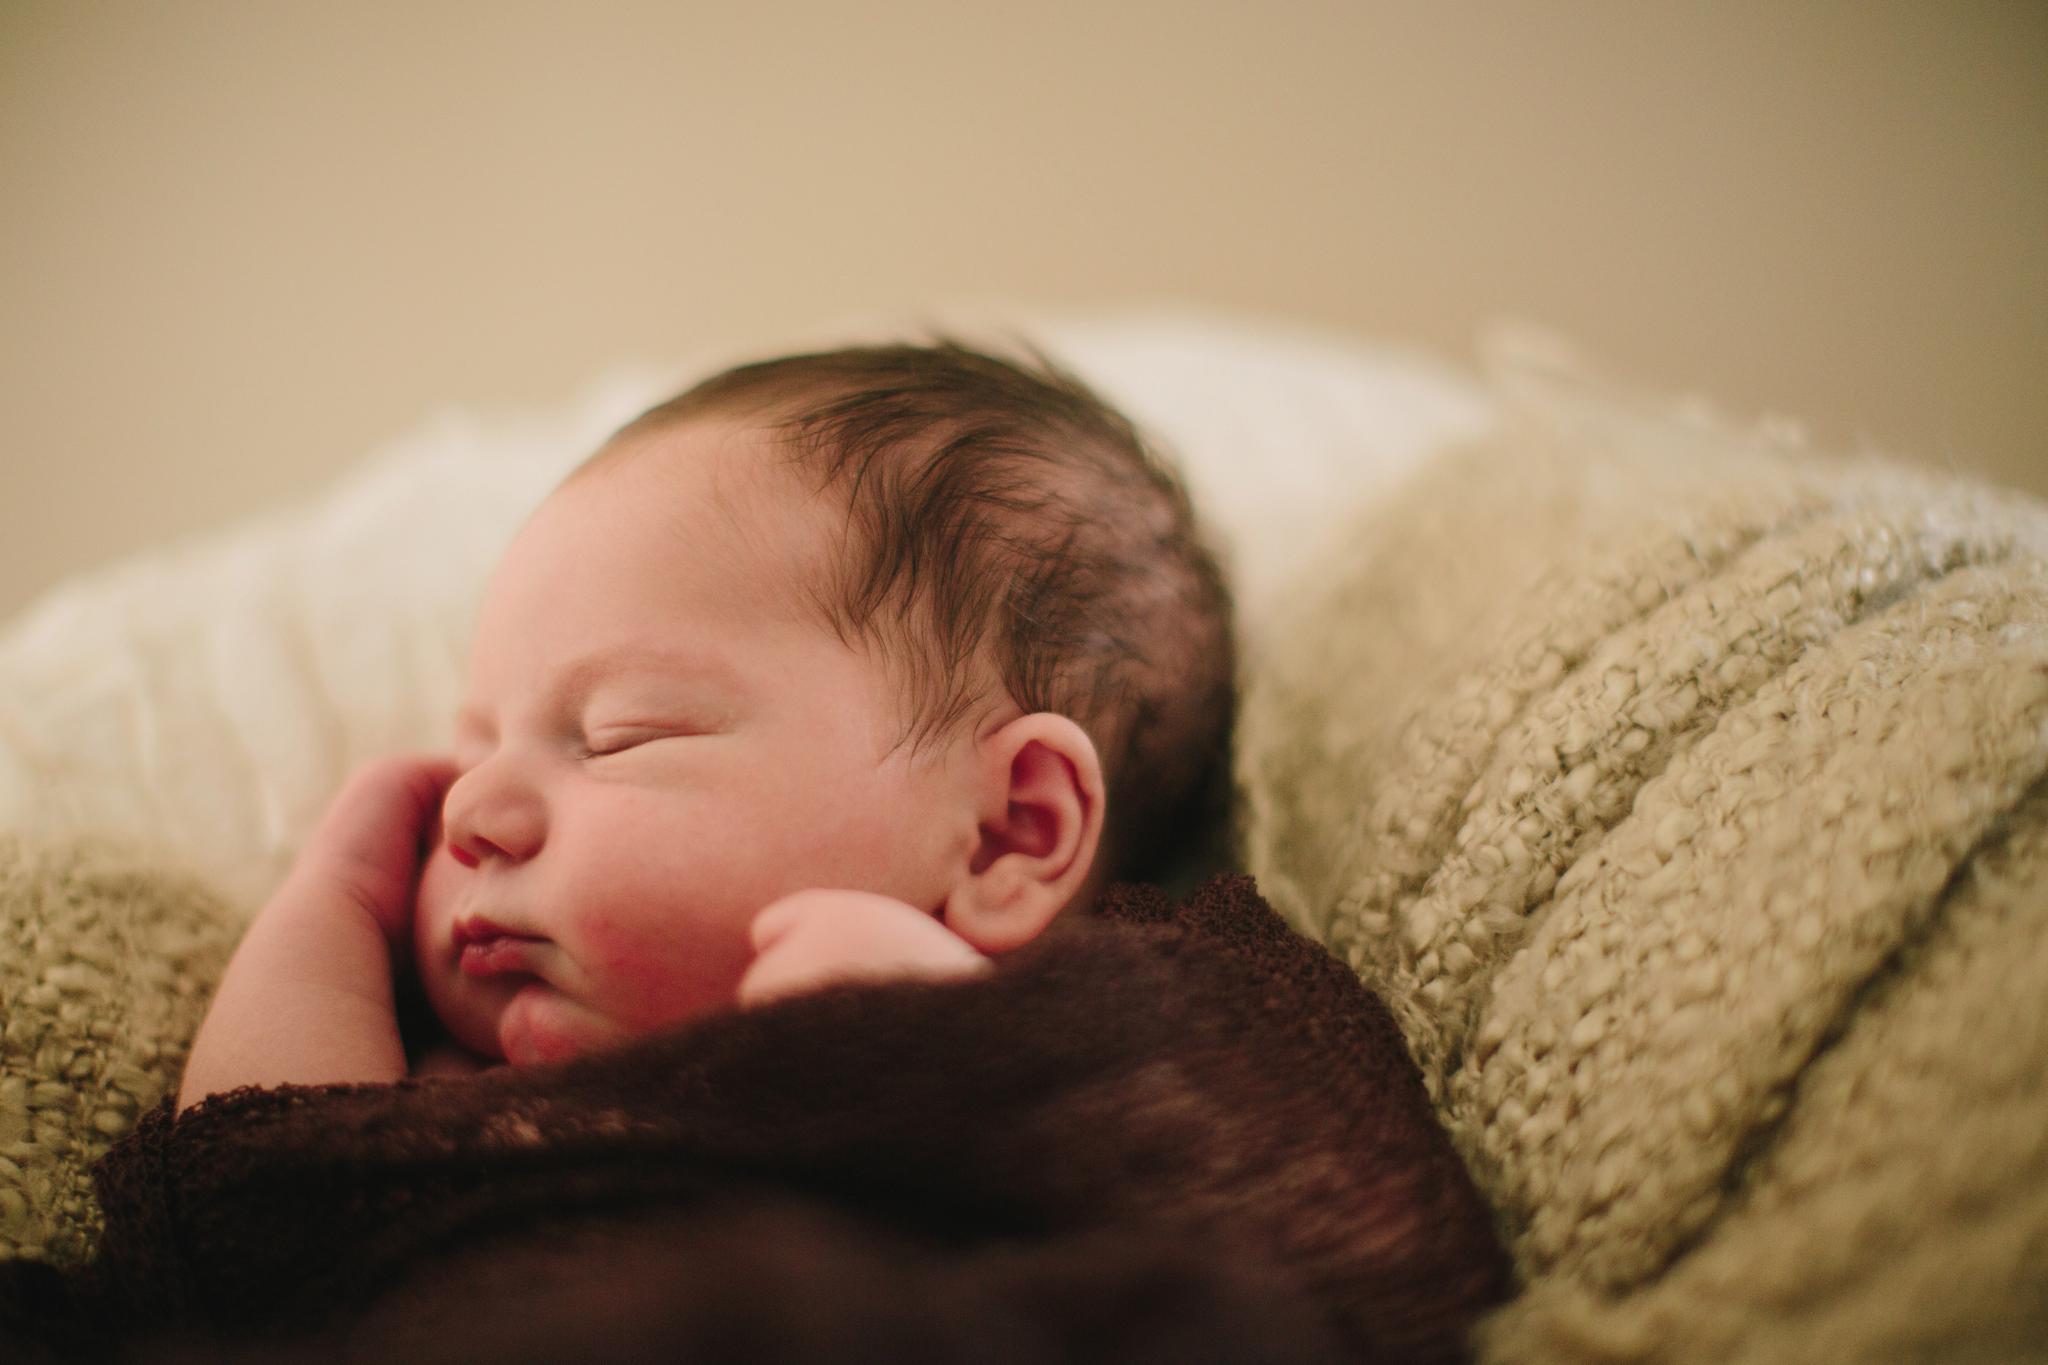 tunkhannock_newborn_photographer_4462.jpg